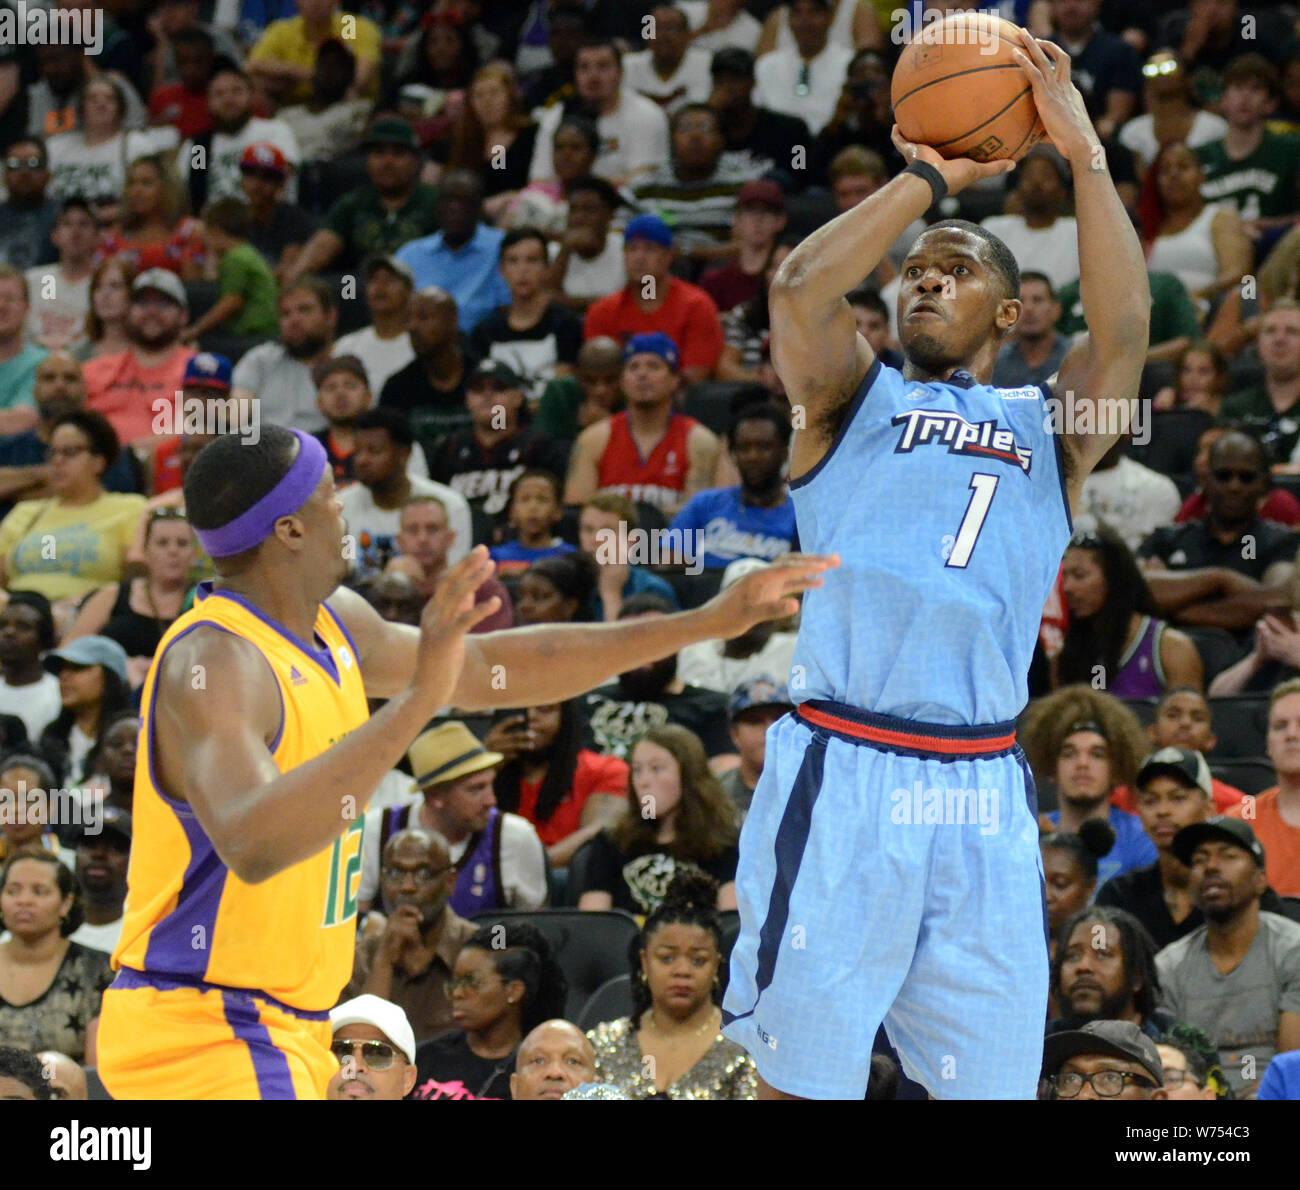 Big3 Basketball League Stock Photos & Big3 Basketball League Stock